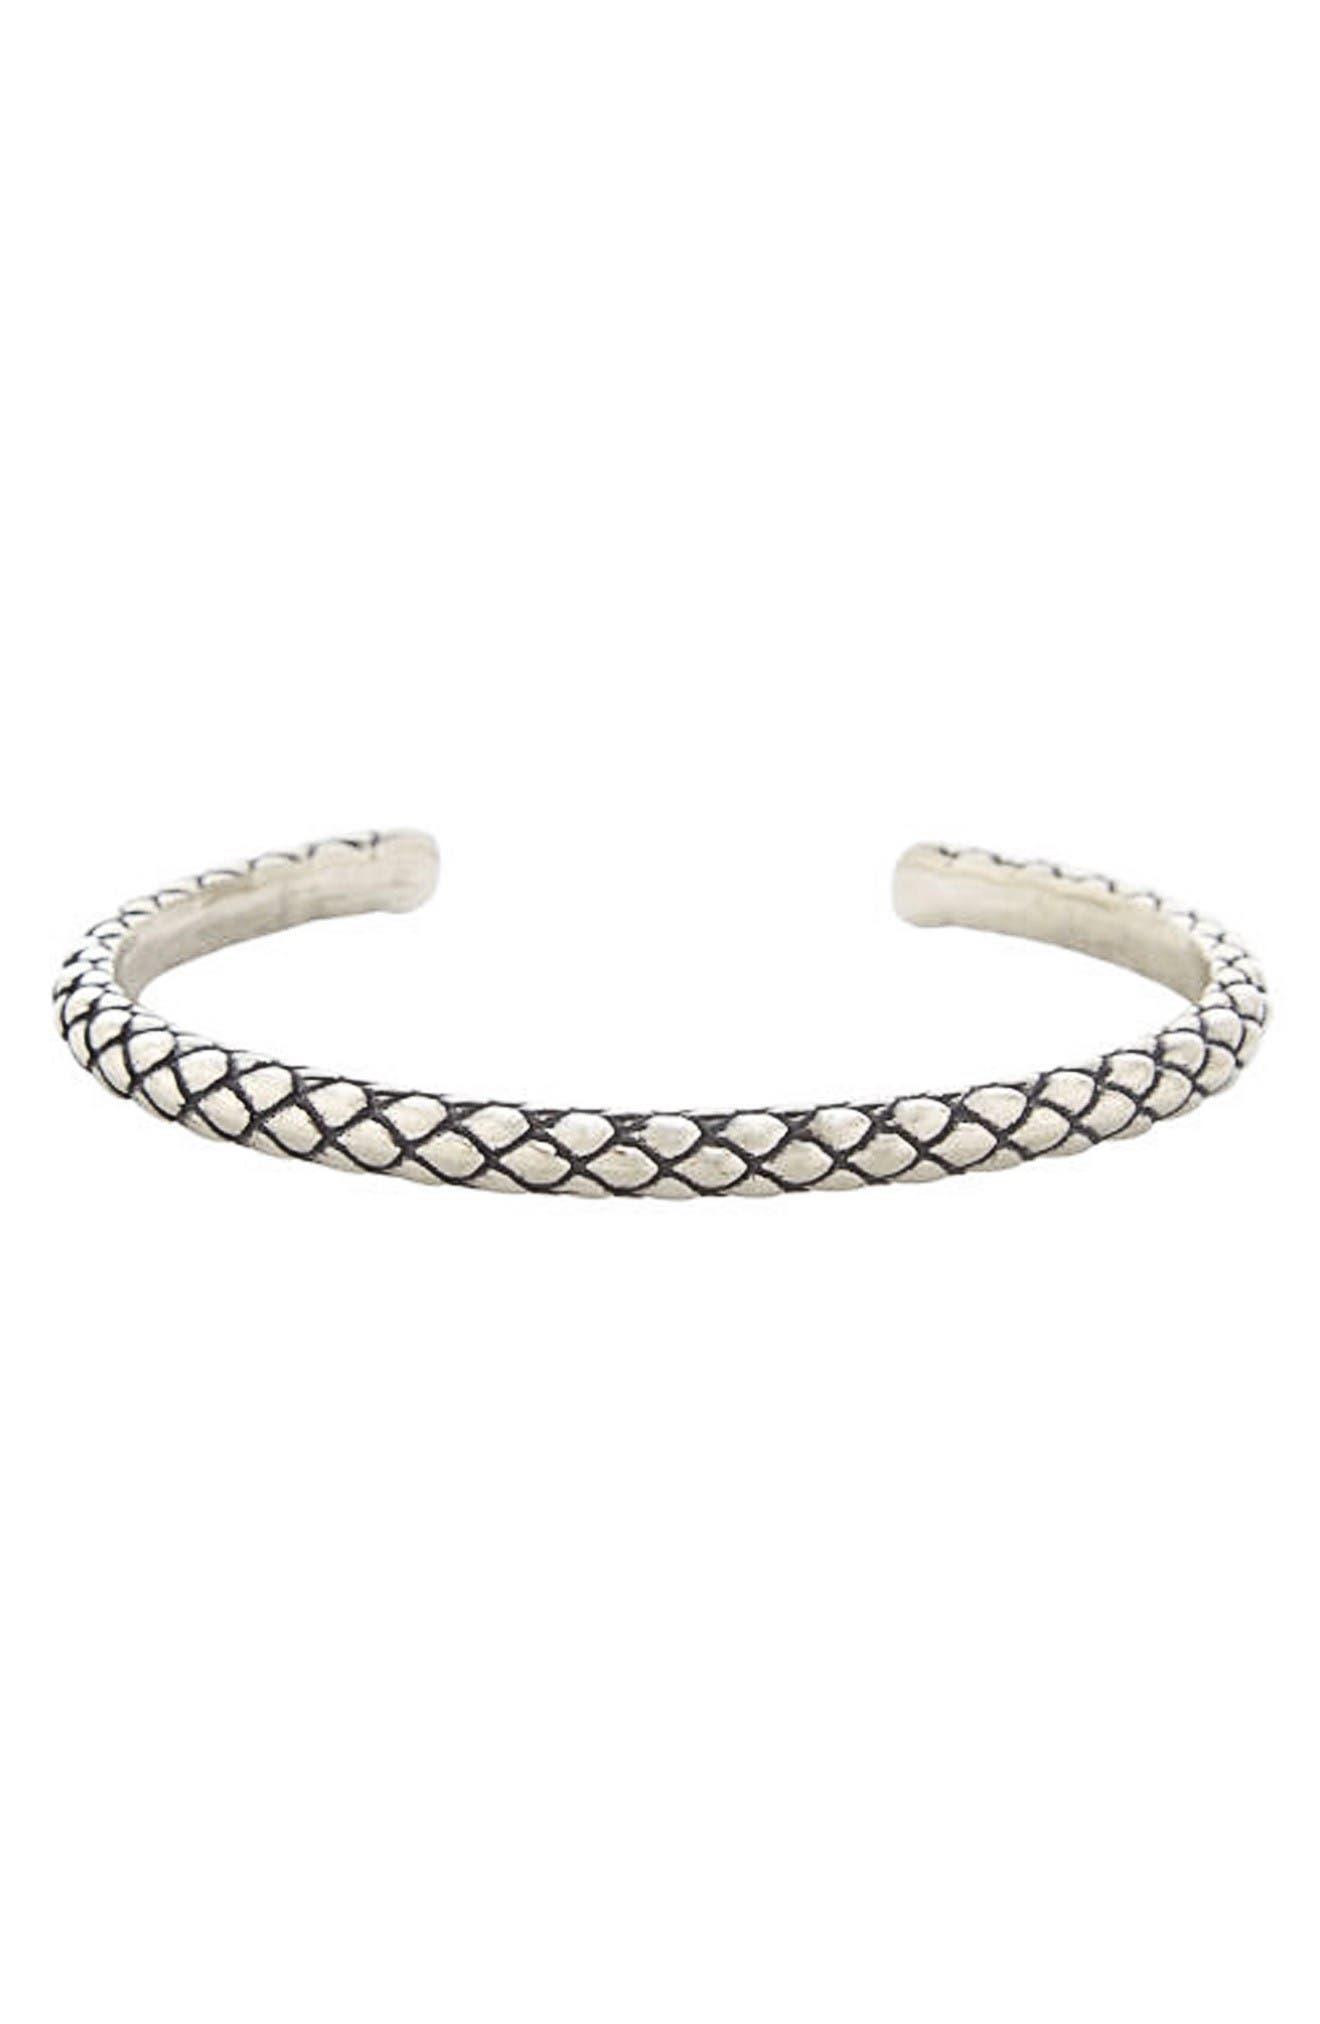 Alternate Image 1 Selected - Degs & Sal Stealth Cuff Bracelet